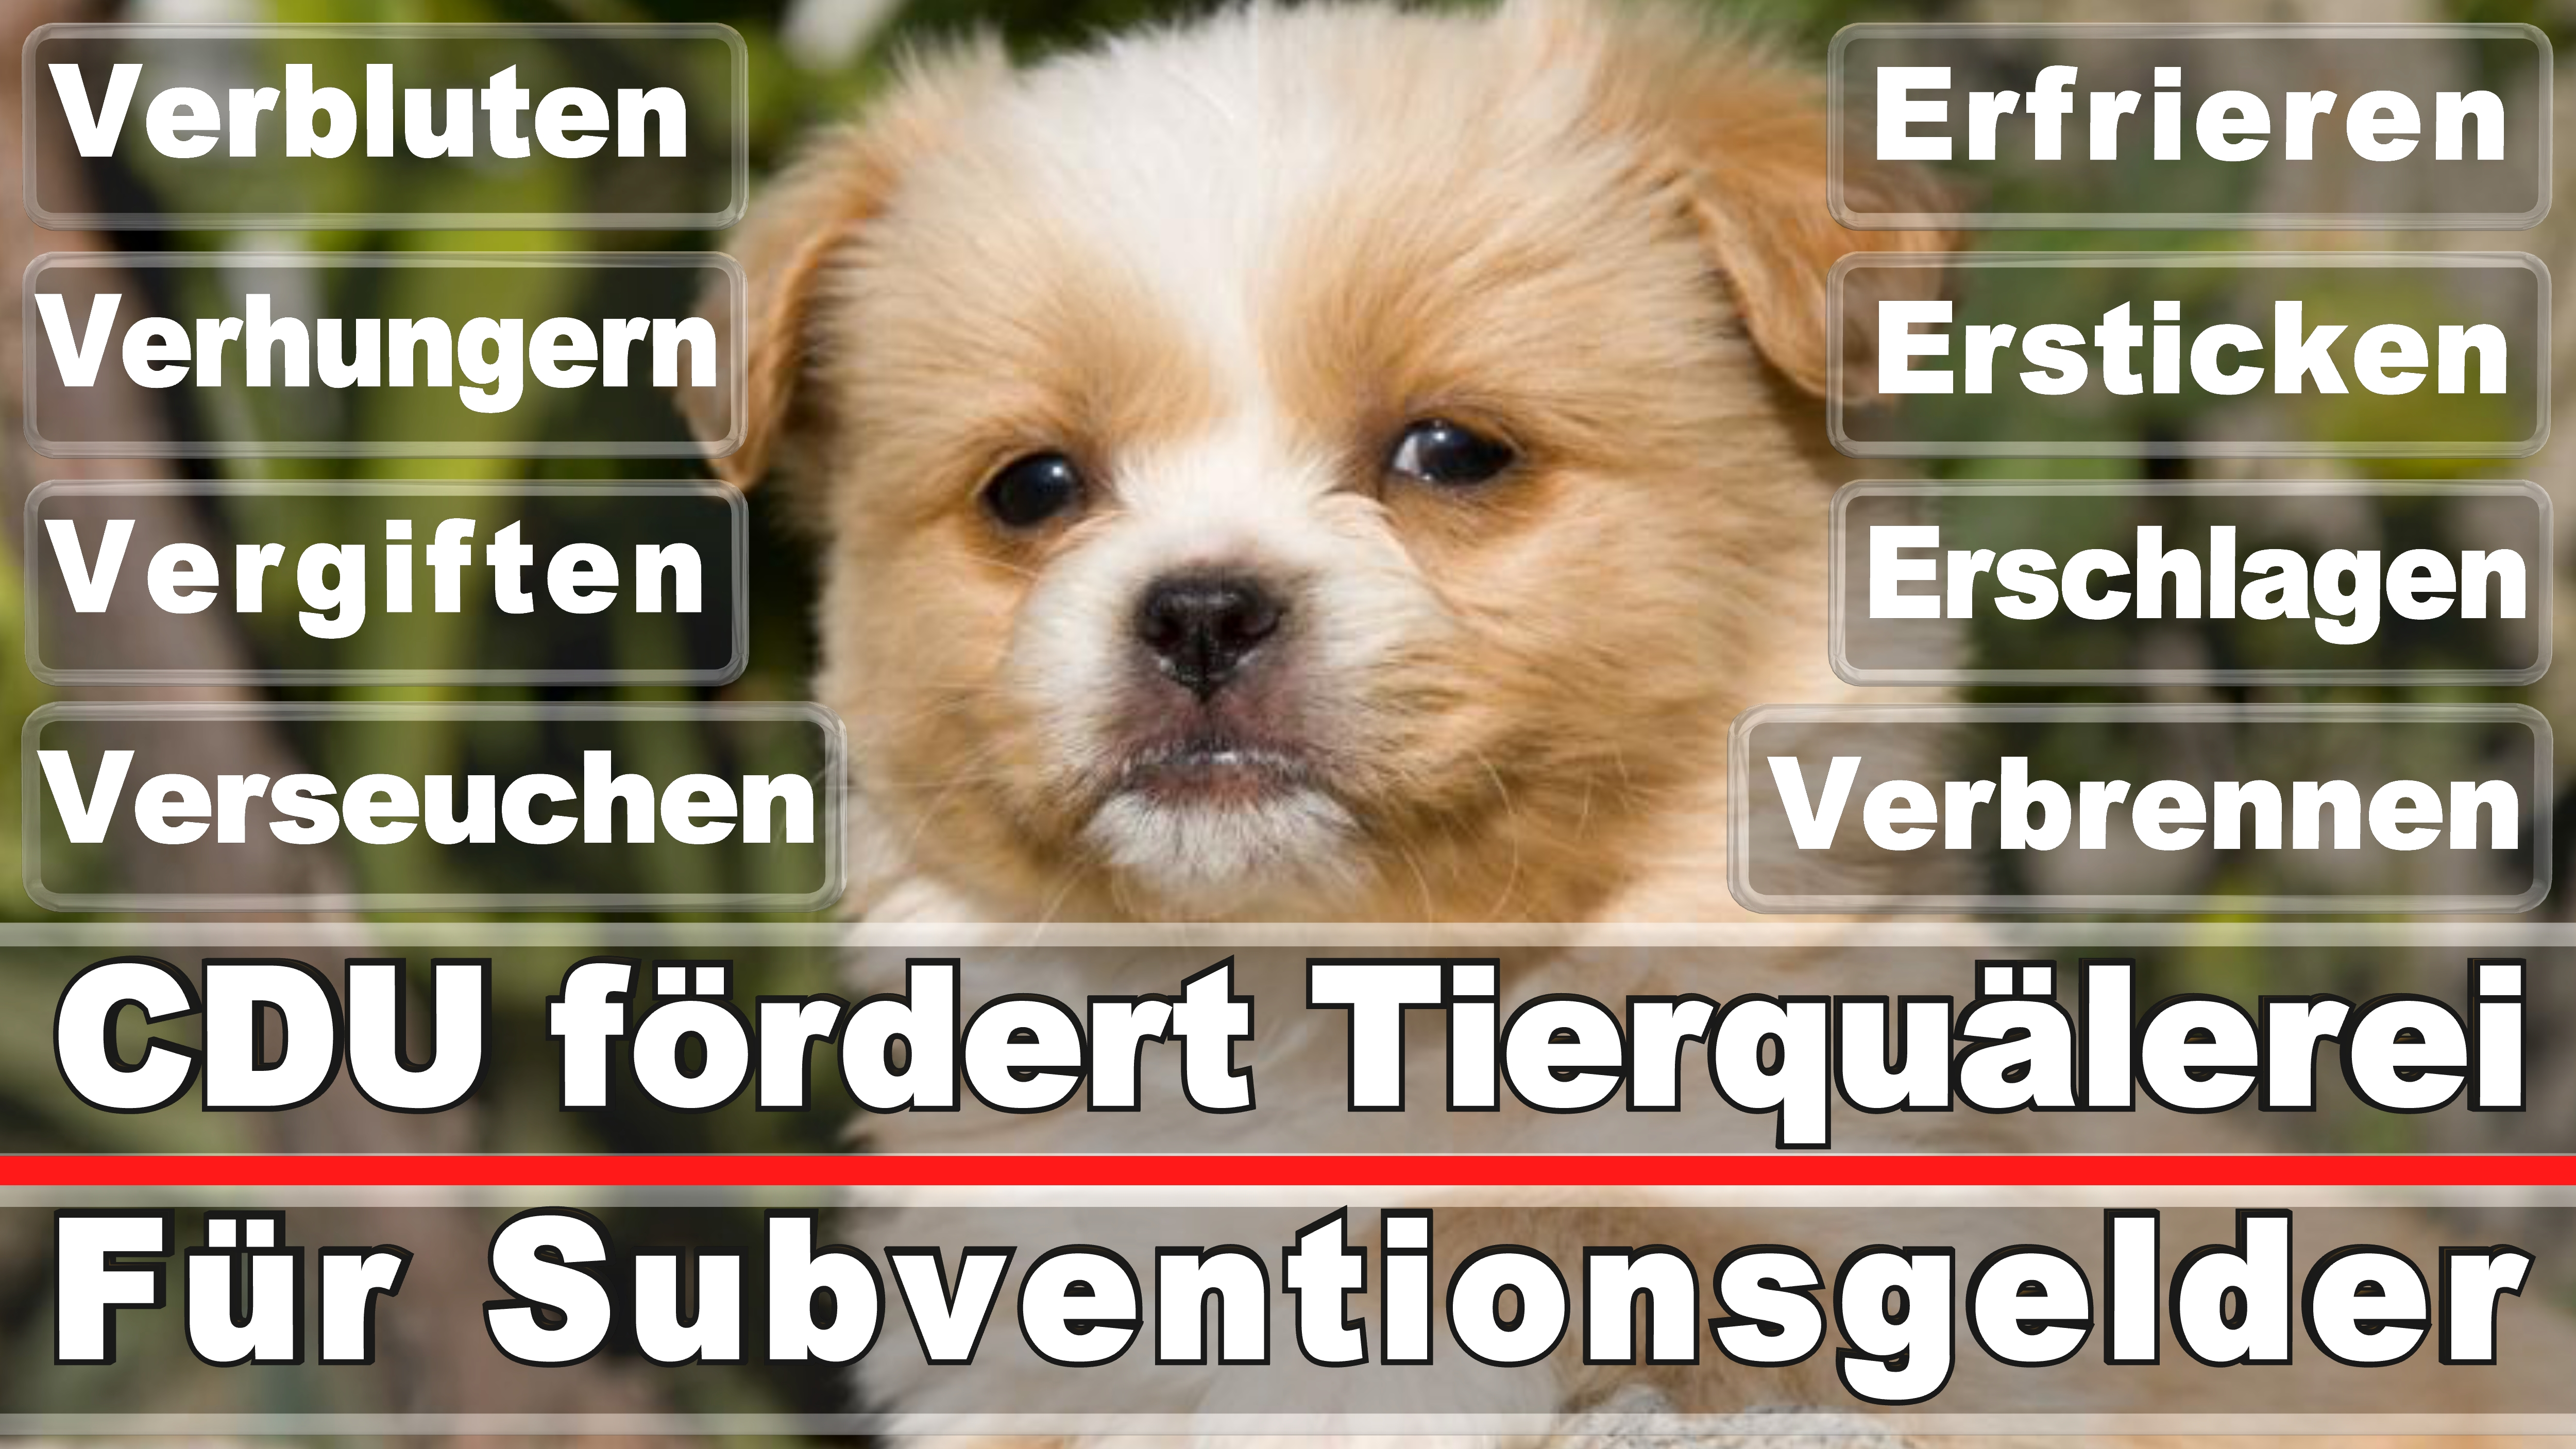 Landtagswahl-Bundestagswahl-CDU-SPD-FDP-AFD-Linke-Piraten-Tierschutzpartei (44)